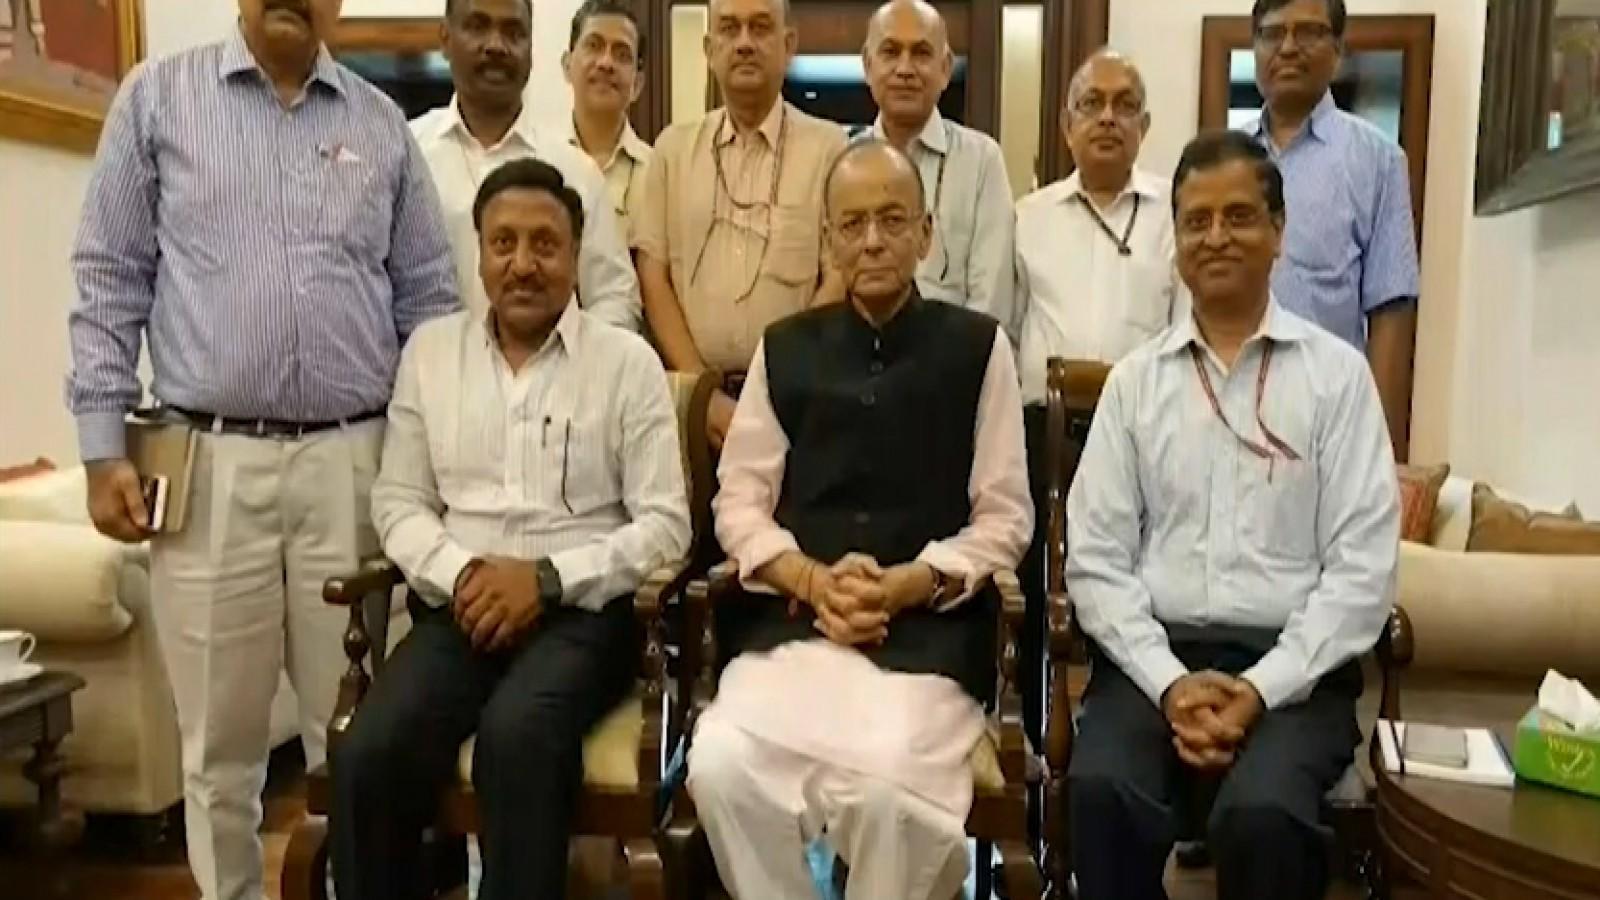 arun-jaitley-meets-with-finance-secretaries-to-discuss-budget